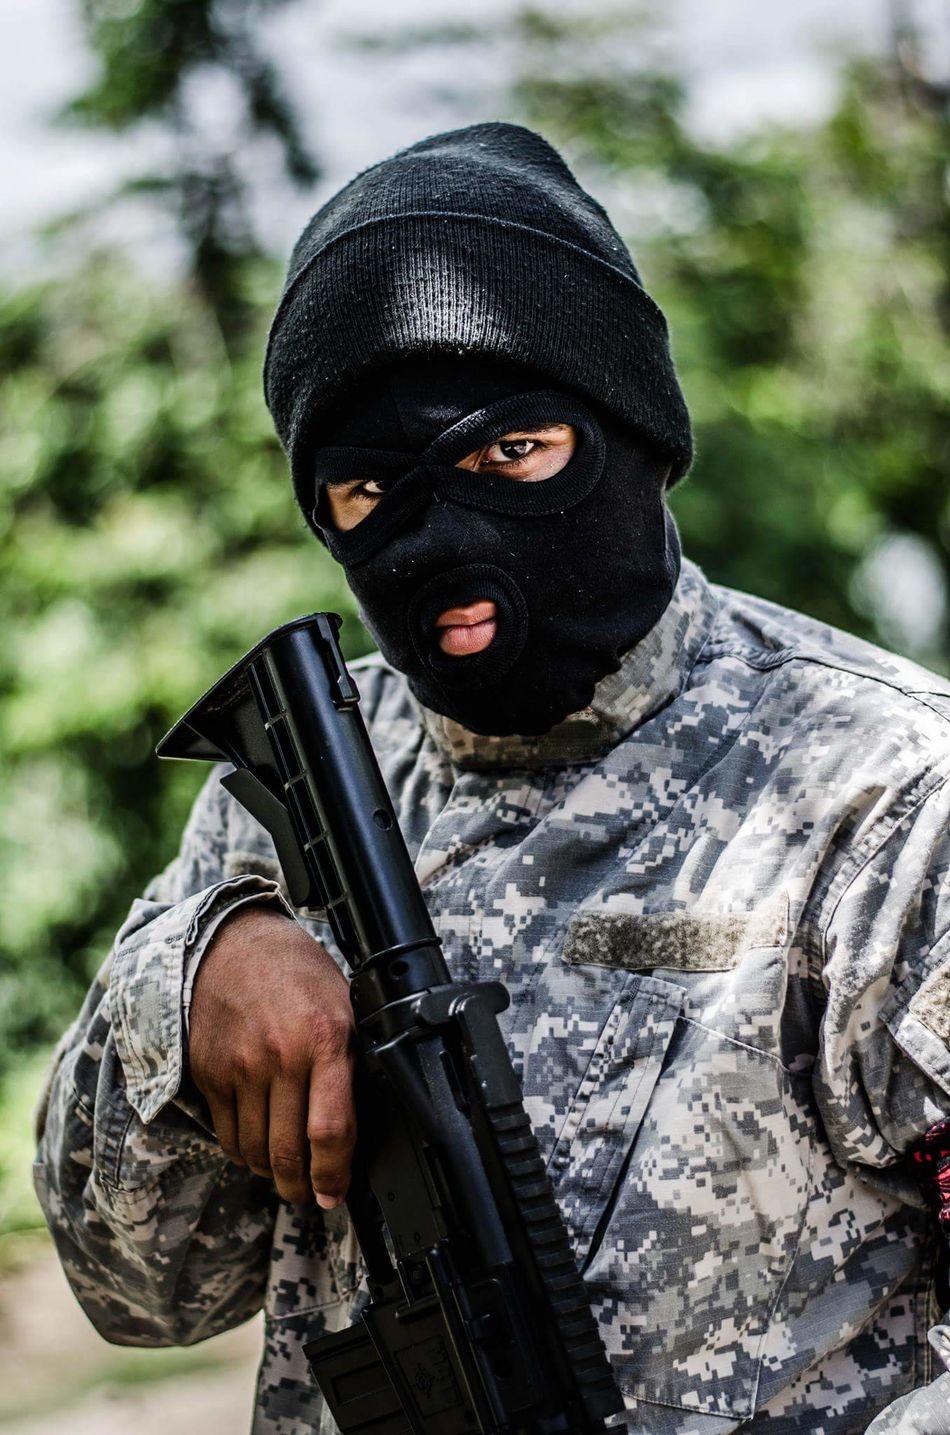 Post A4 Military Bountyhunter Photography Portrait Apocalypse Scenic Postapocalyptic AK47 Fantasy Violent Hostile Baclava